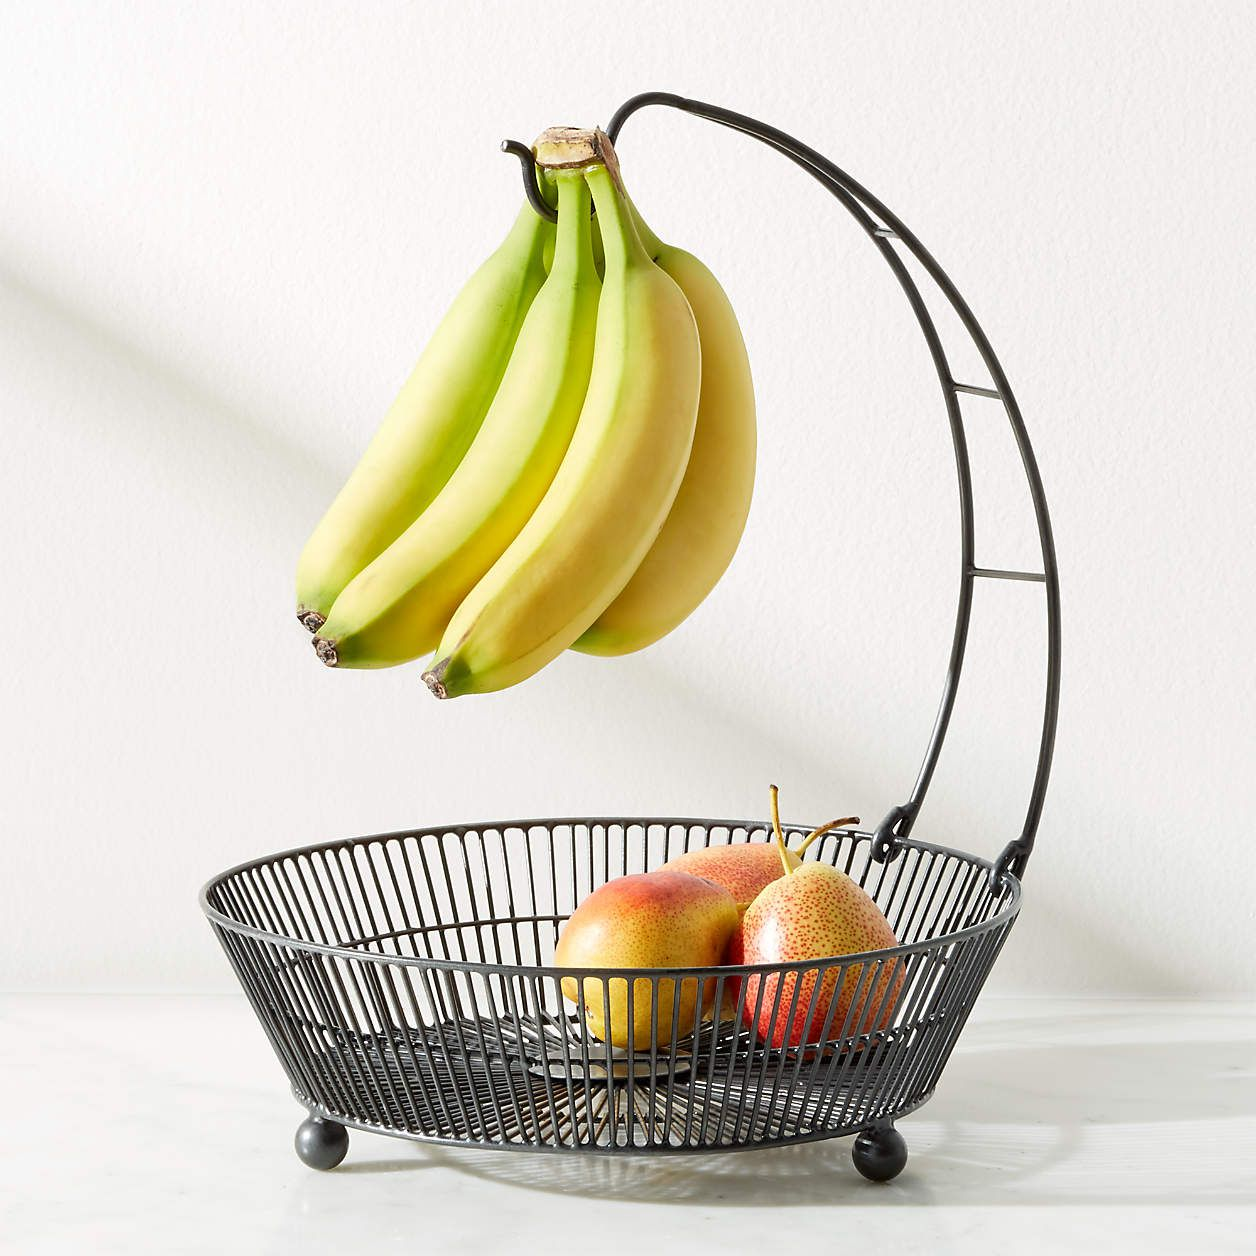 crate-and-barrel-barrett-banana-holder-with-basket